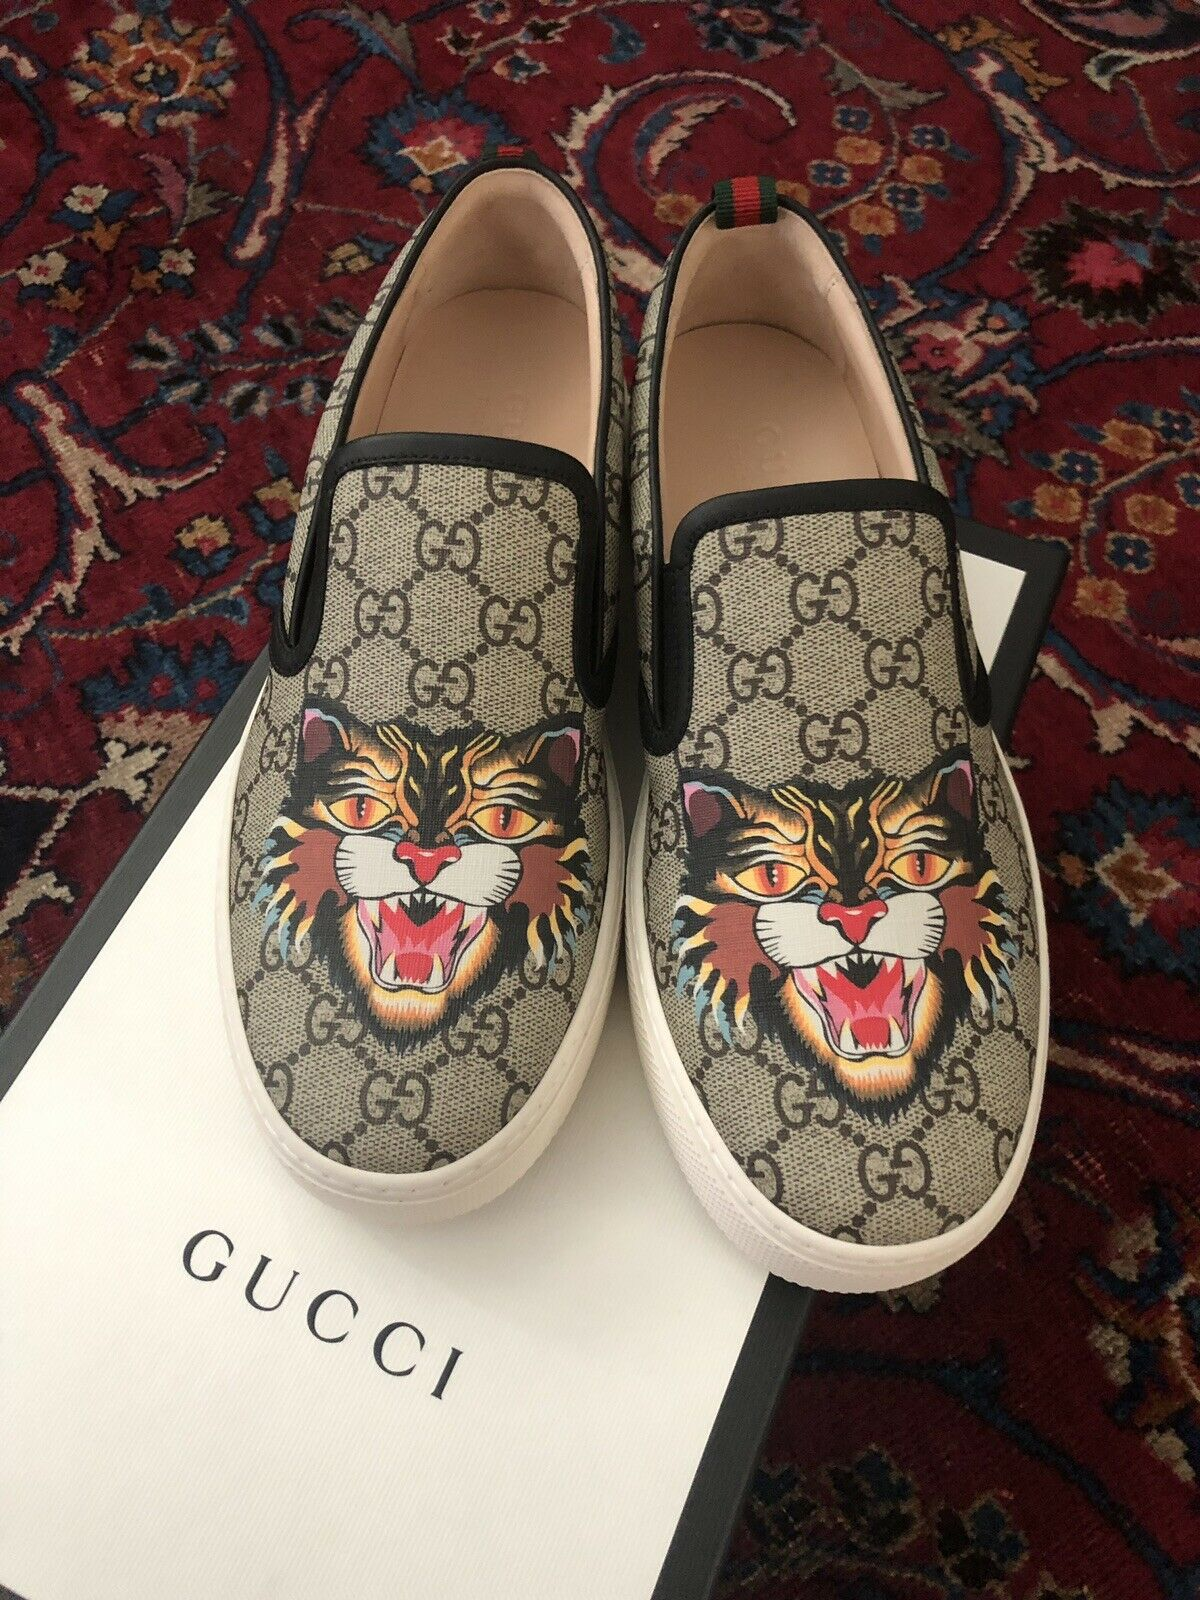 NIB Gucci Supreme Angry Cat Slip On M 8.5US